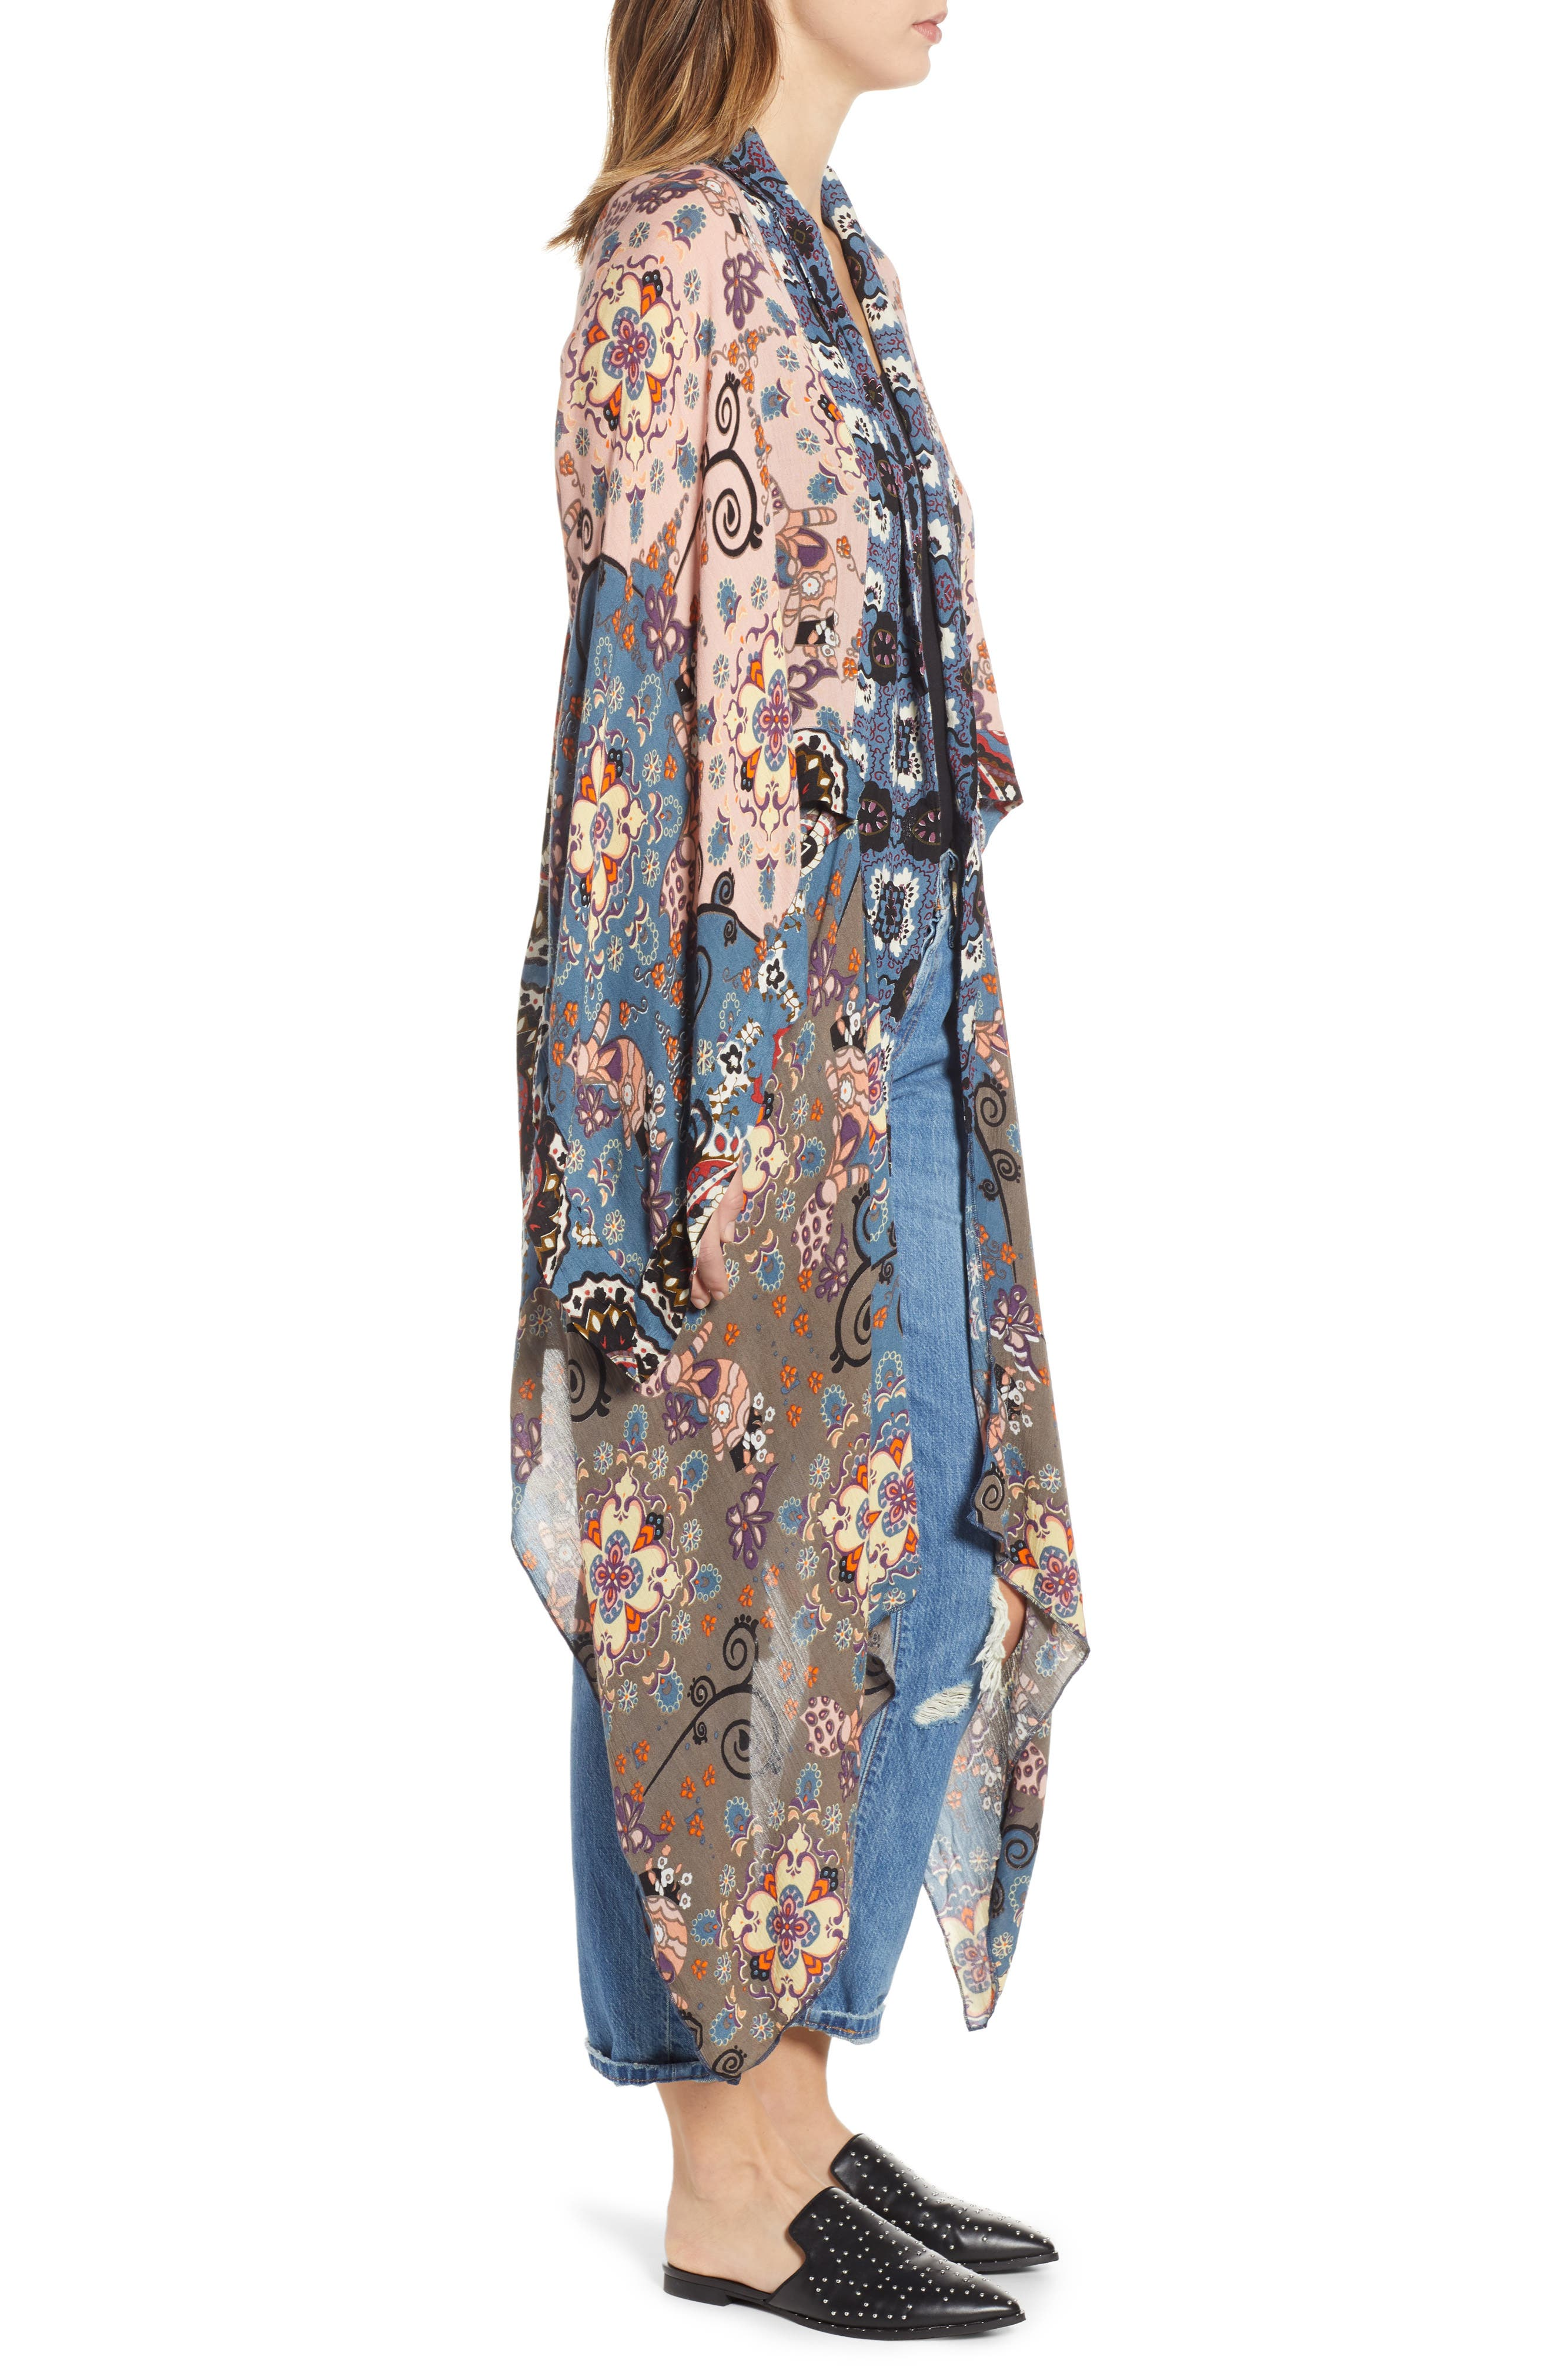 FREE PEOPLE, Little Wing Kimono, Alternate thumbnail 3, color, 005